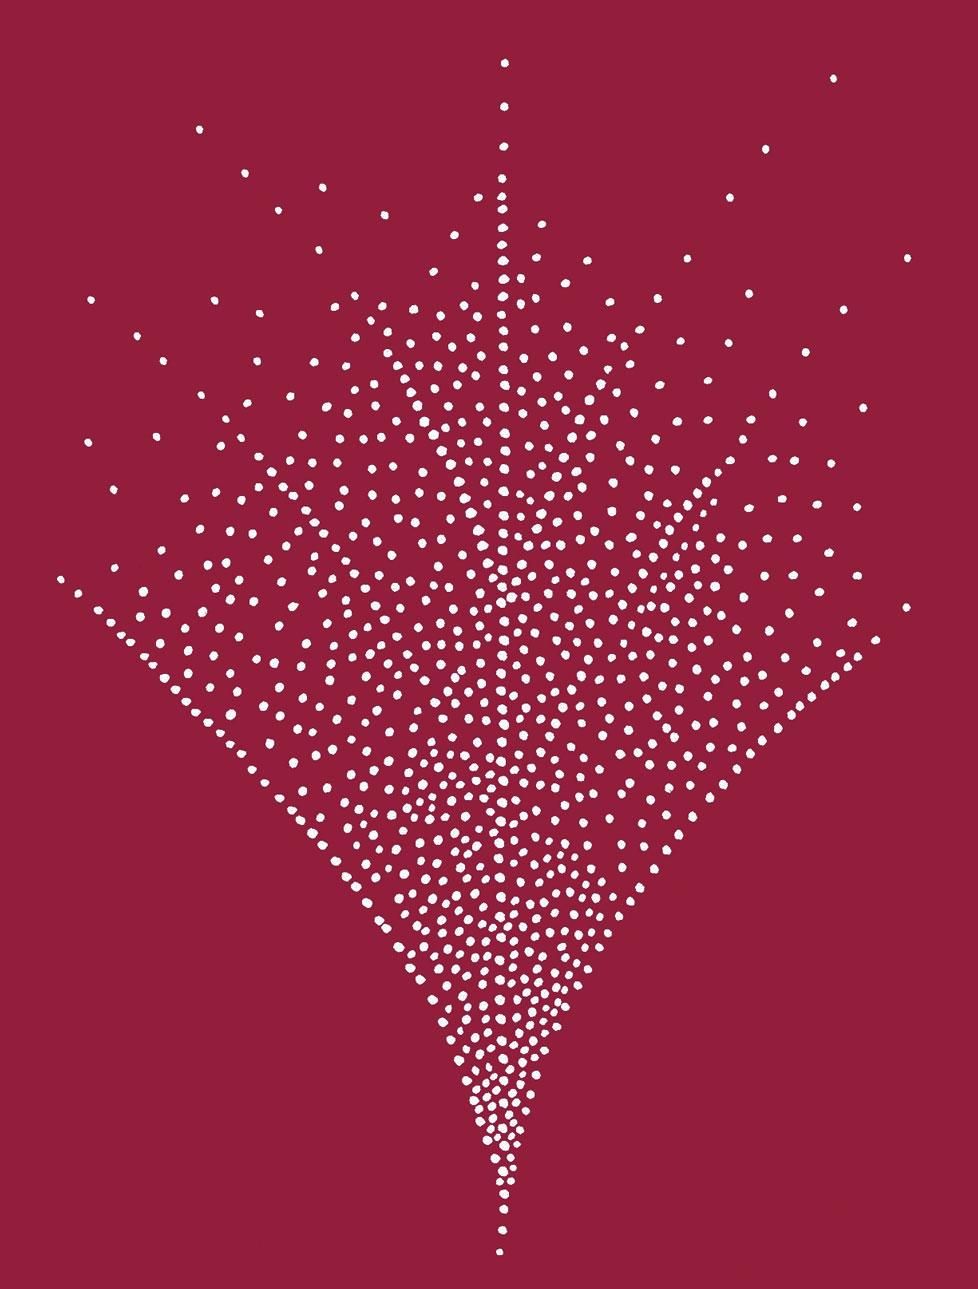 patterns-5.jpg